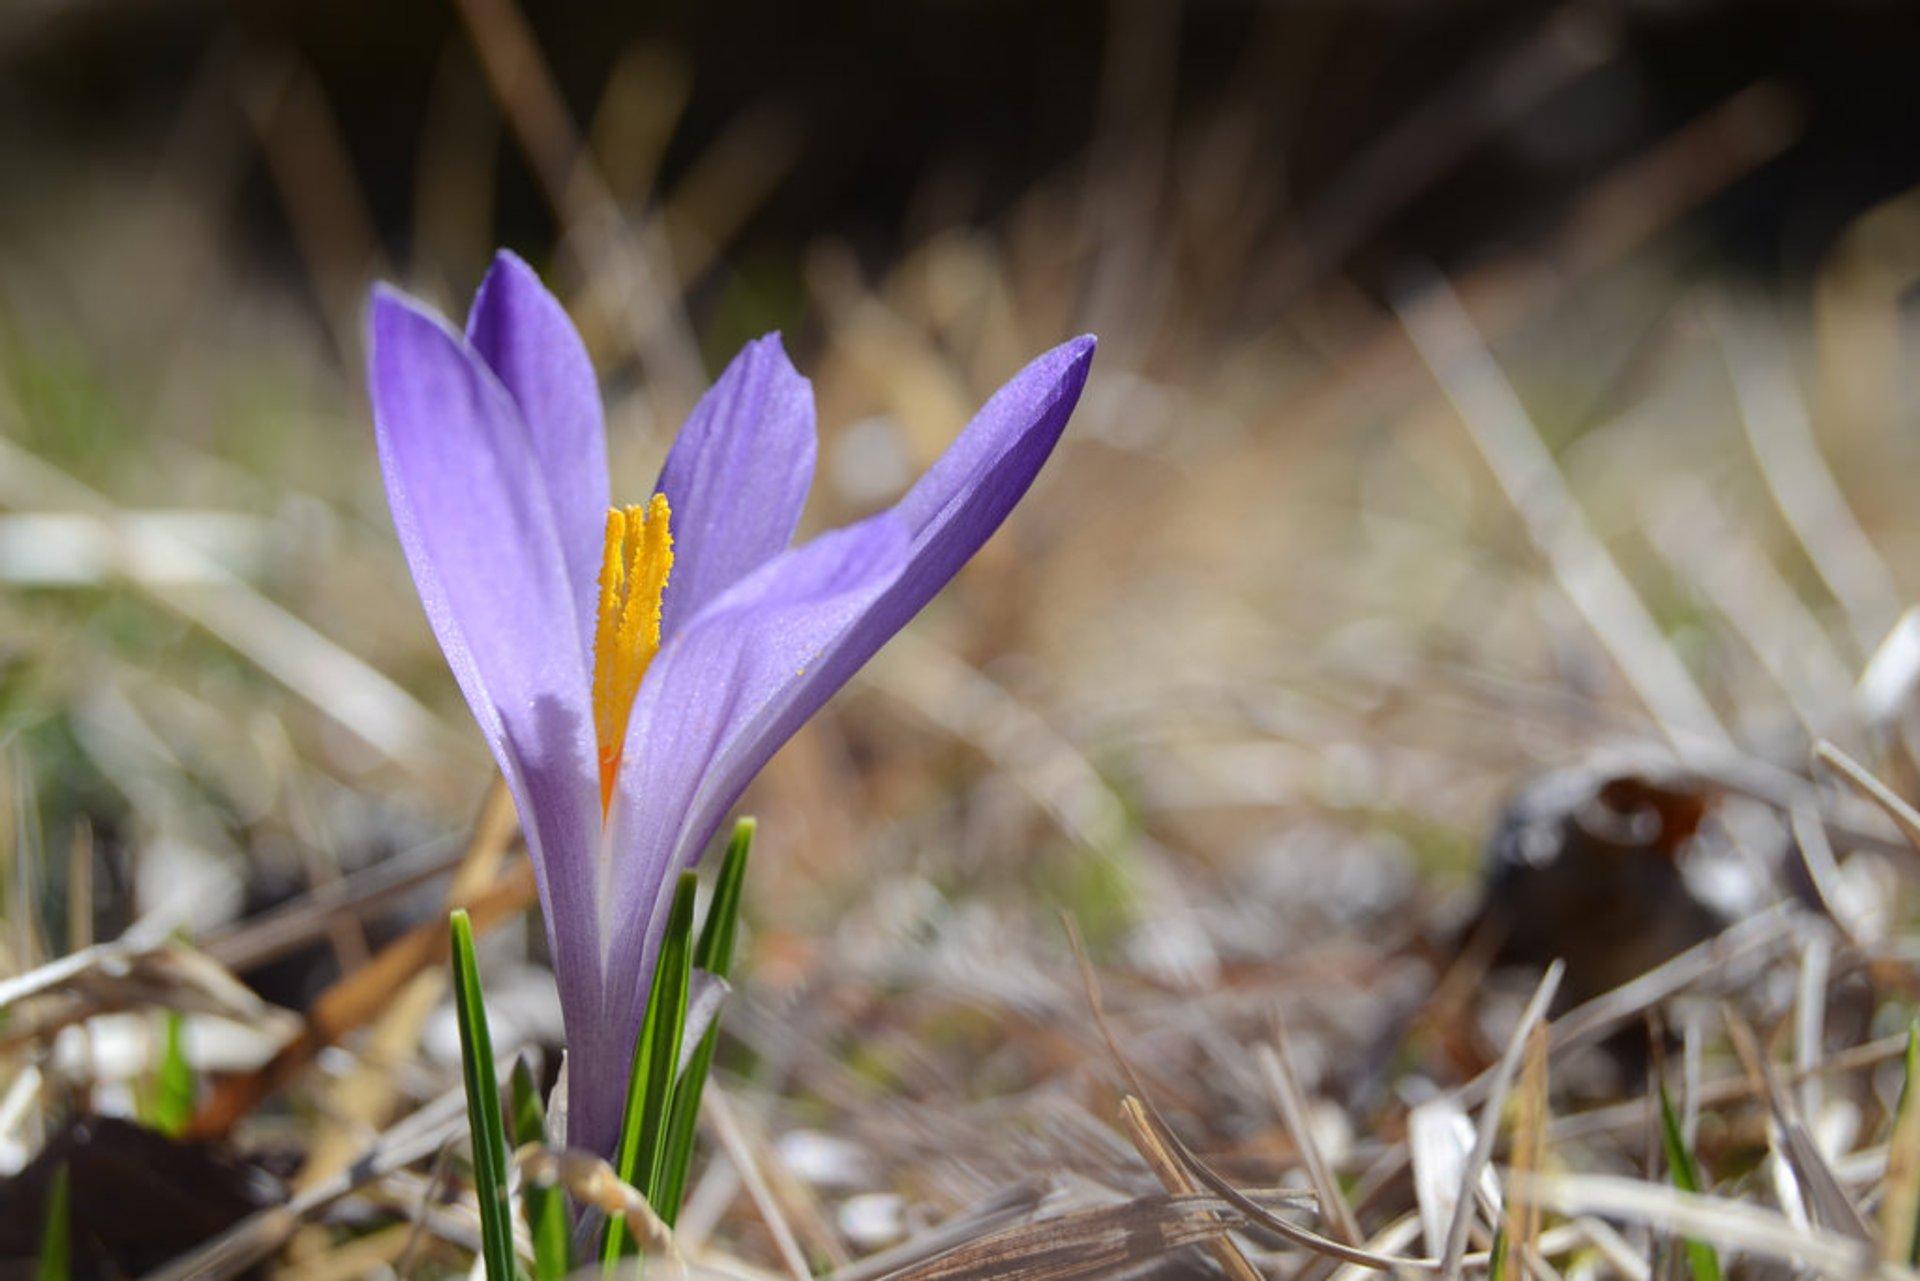 Saffron Harvest in Greece - Best Season 2019